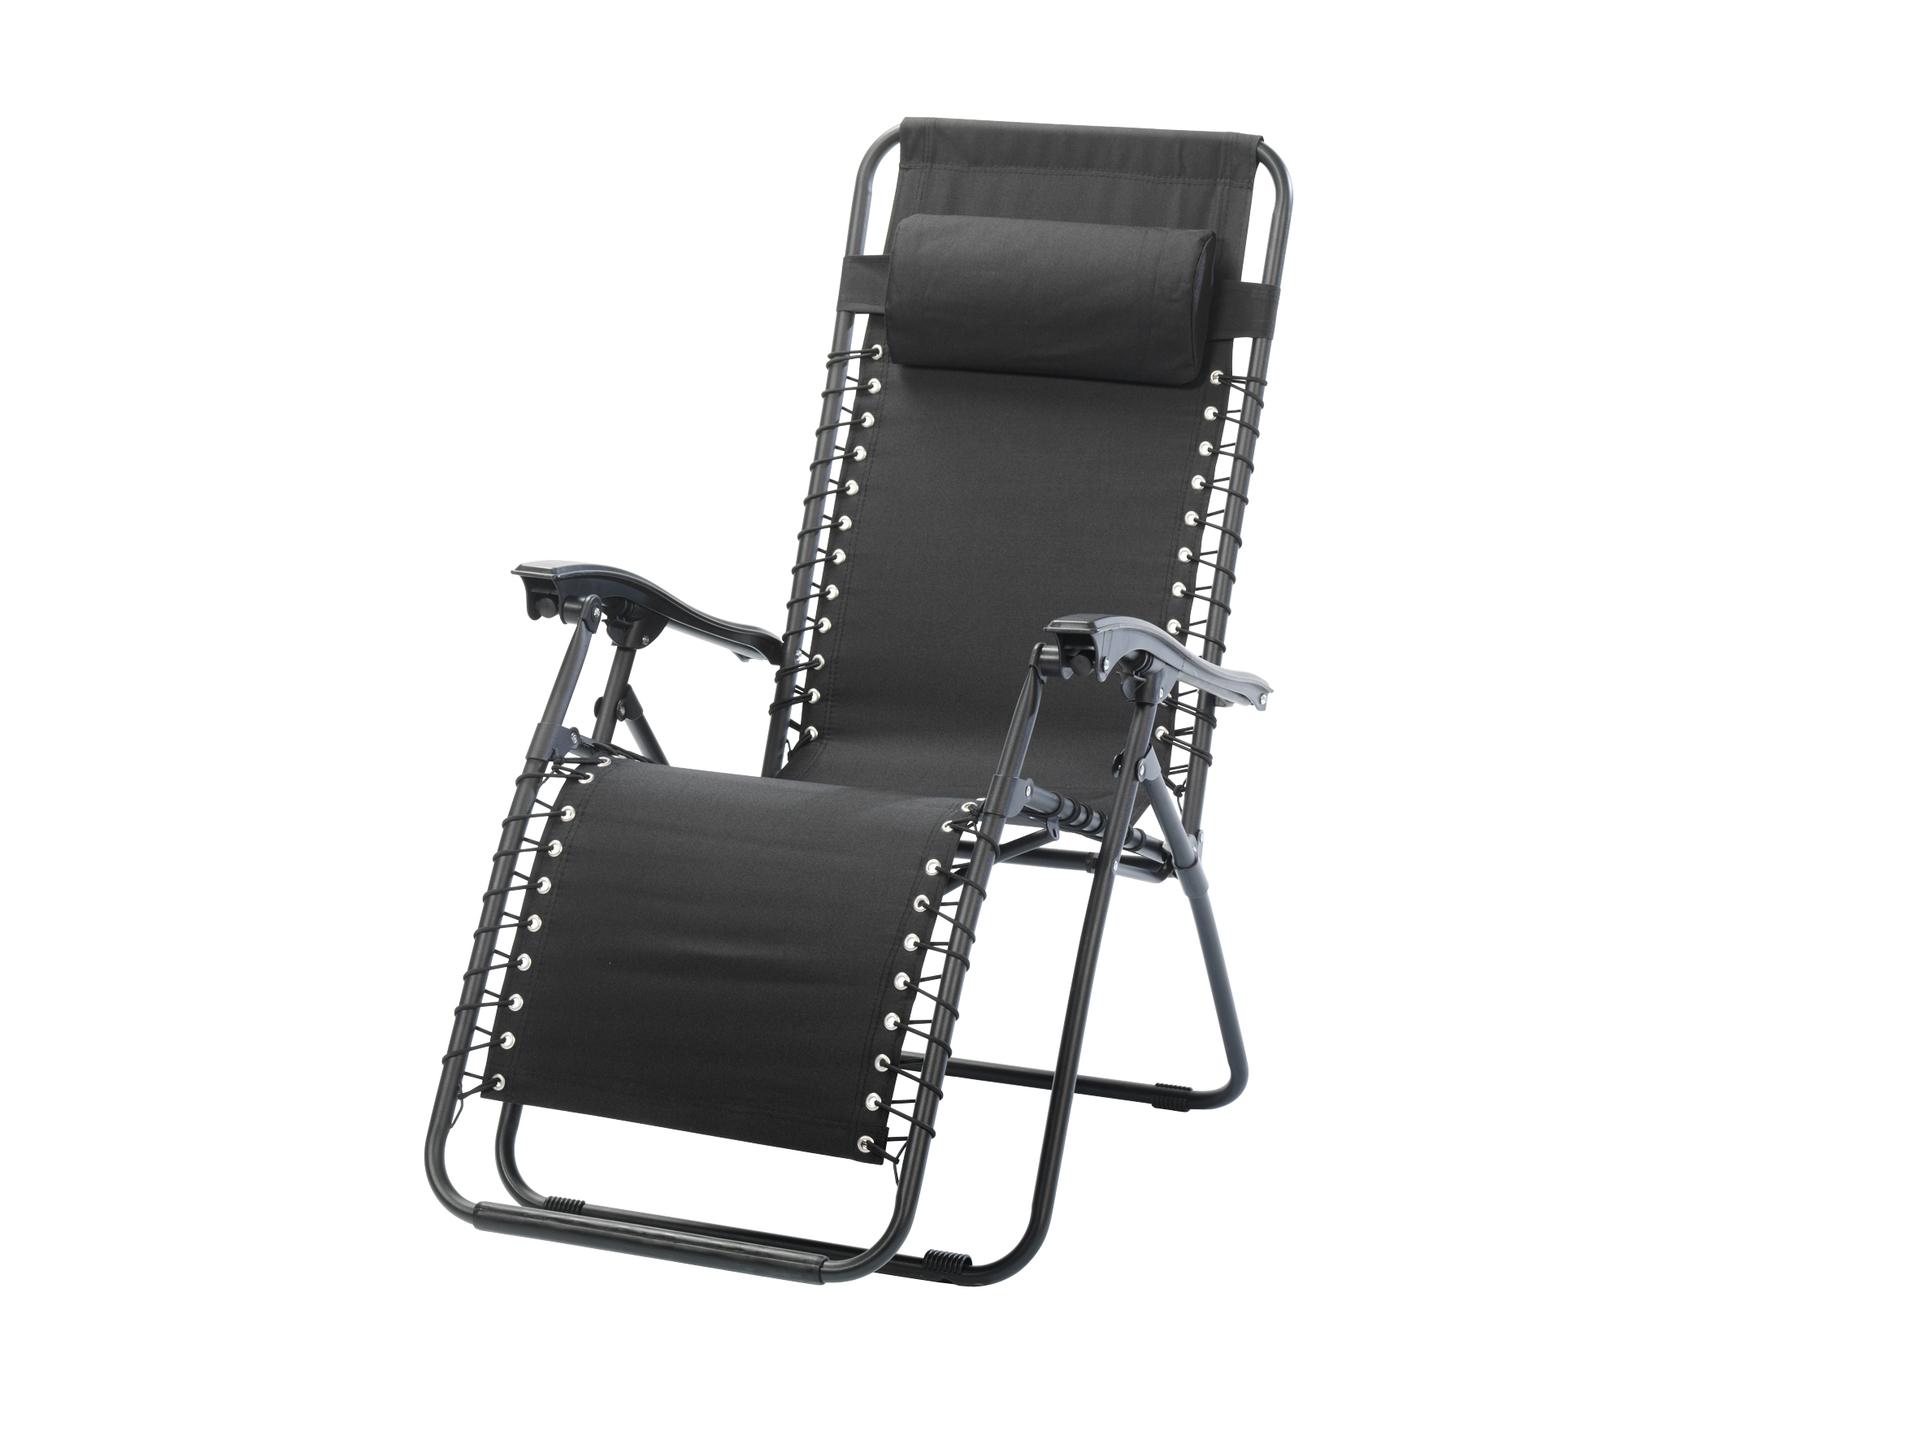 stunning chaise de jardin relax ideas. Black Bedroom Furniture Sets. Home Design Ideas